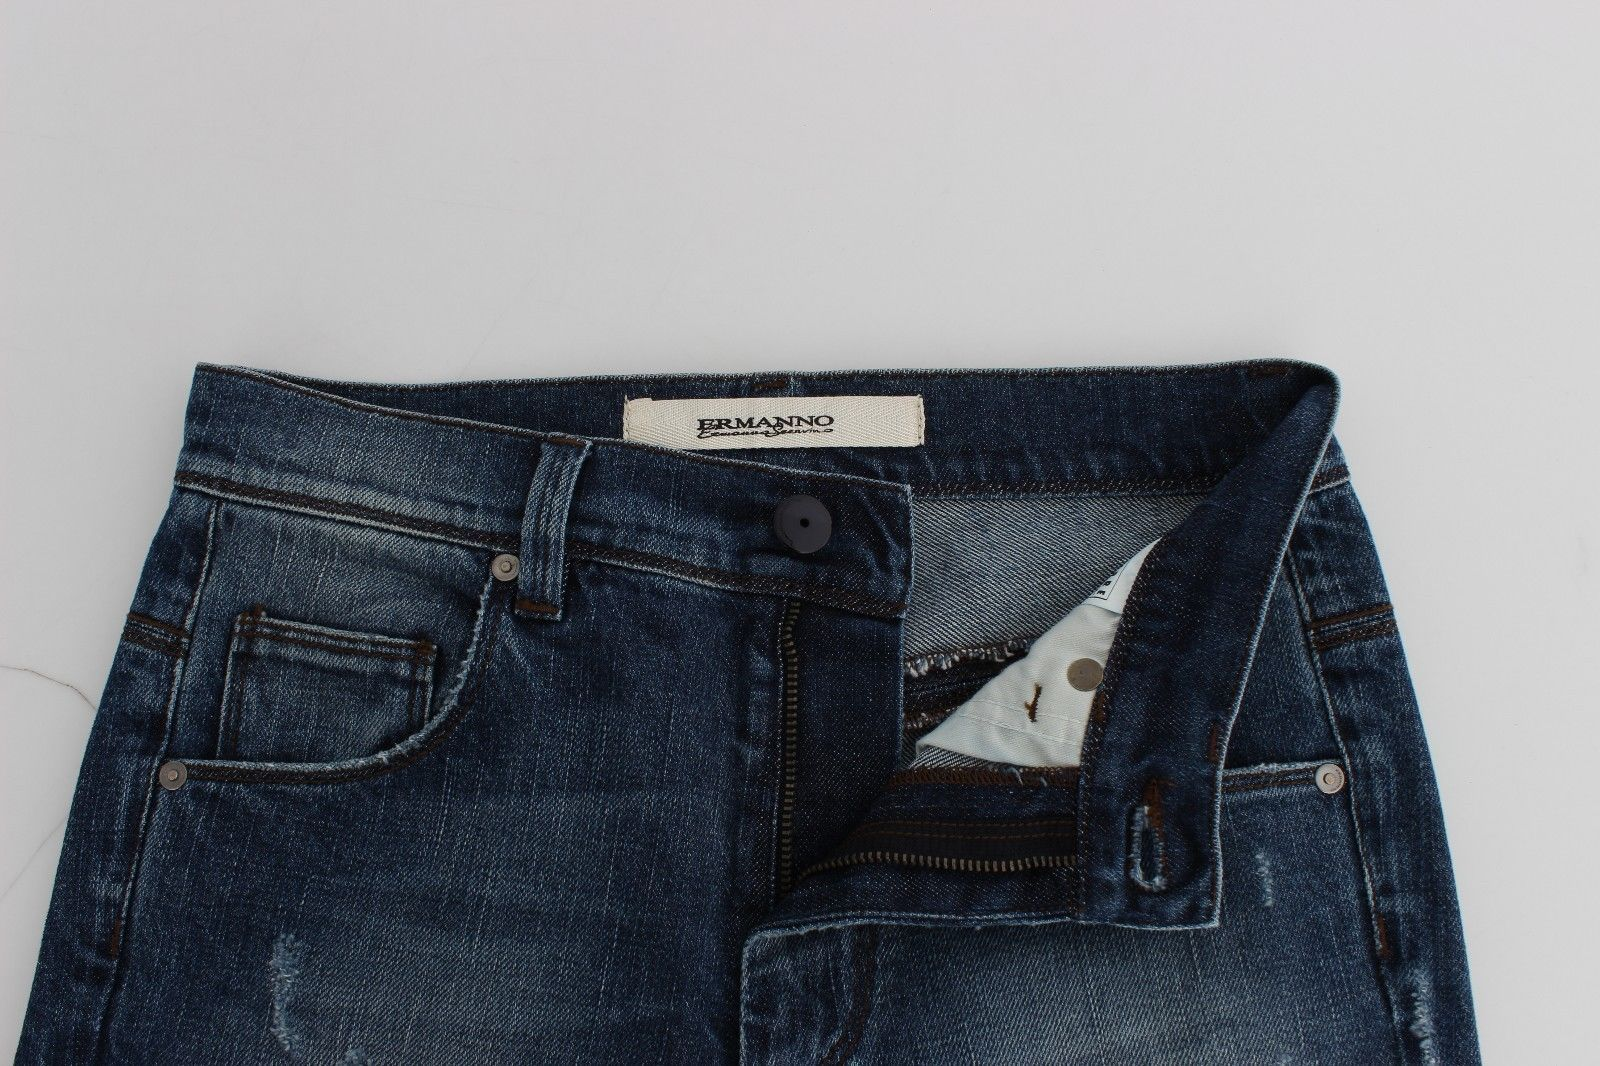 Ermanno Scervino Blue Straight Jeans Denim Pants High Waist